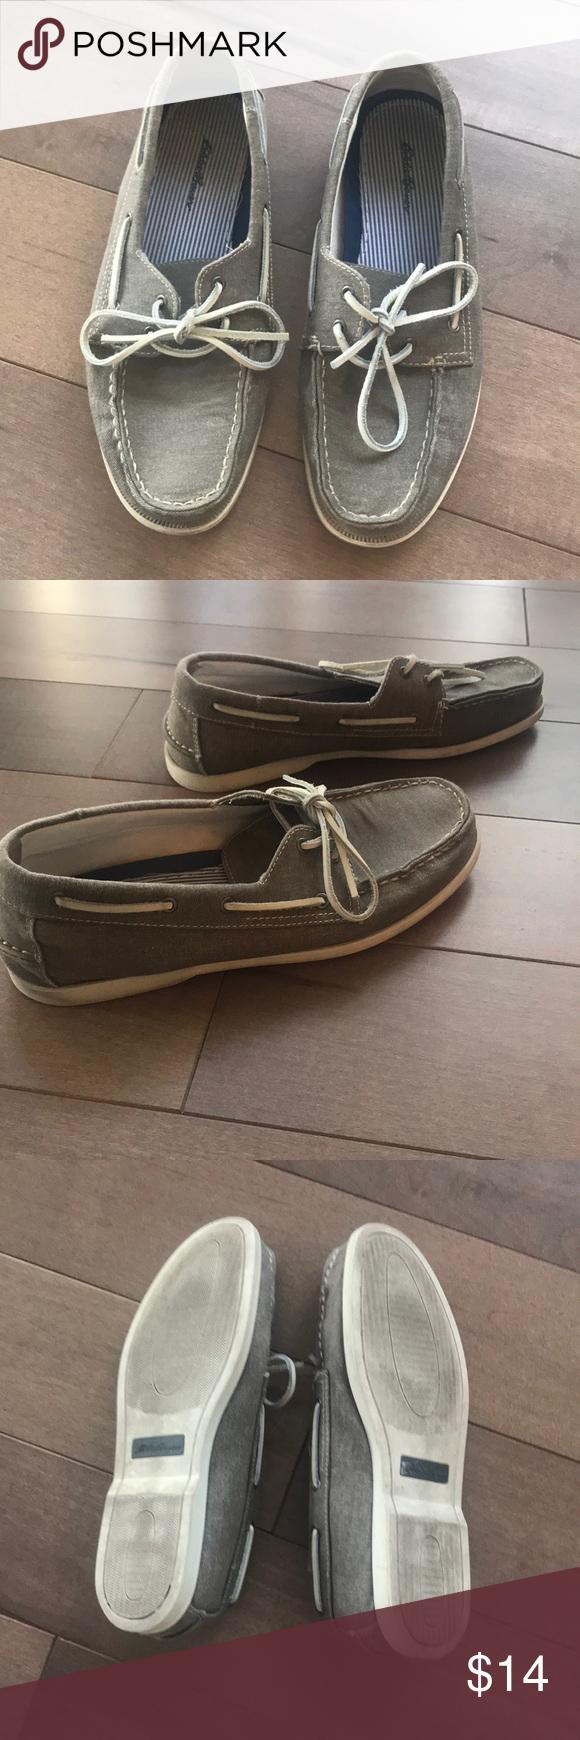 Men's Eddie Bauer Gray Boat Shoes Boat shoes